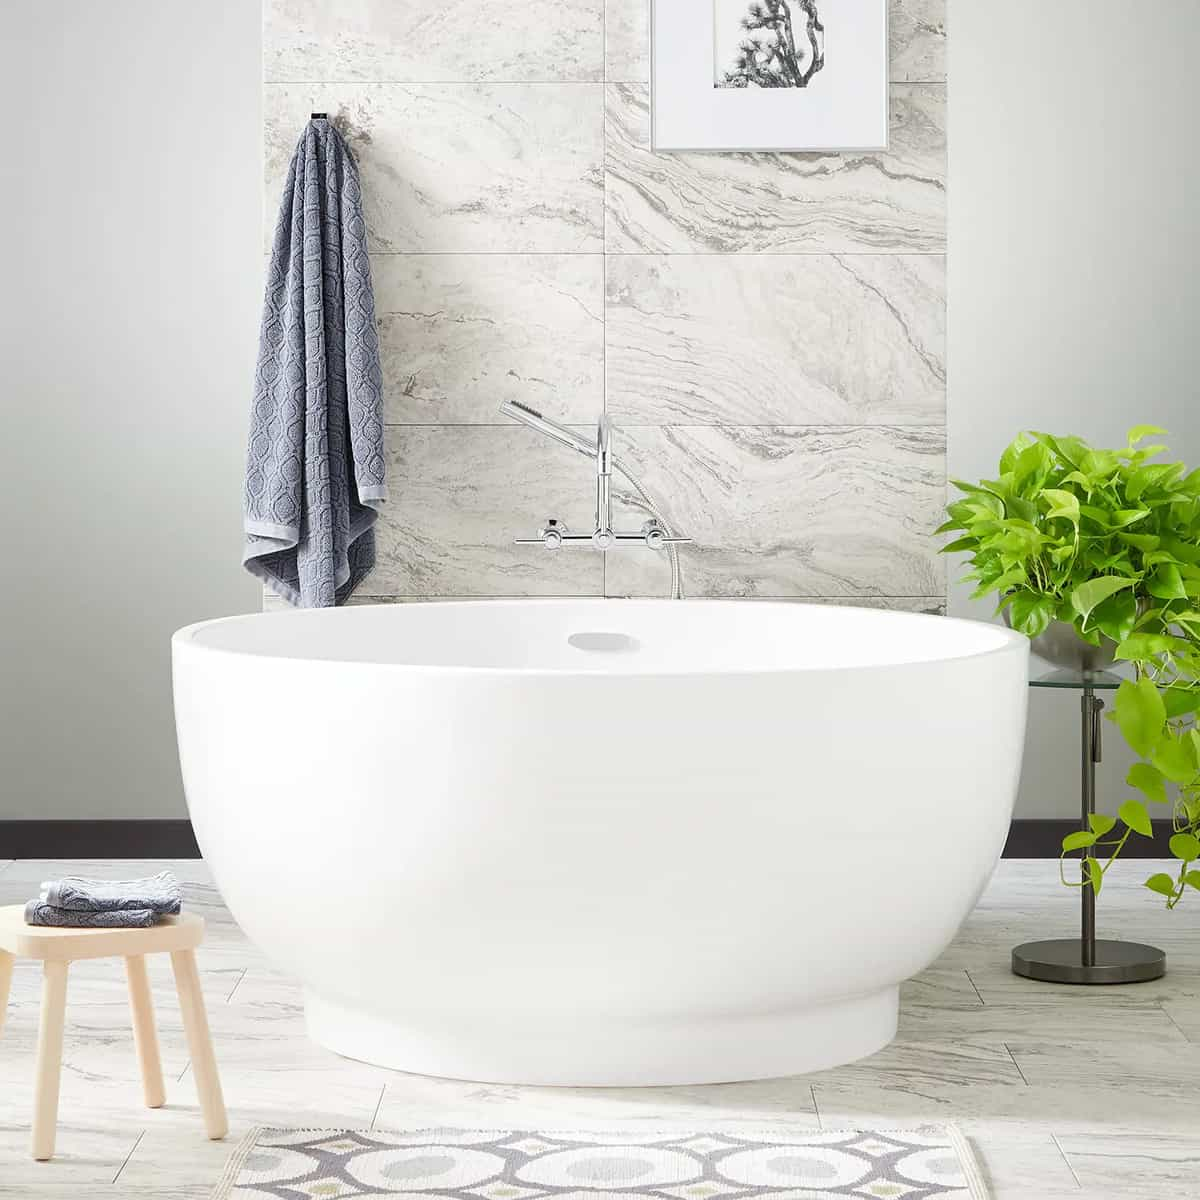 White Oval Acrylic Tub